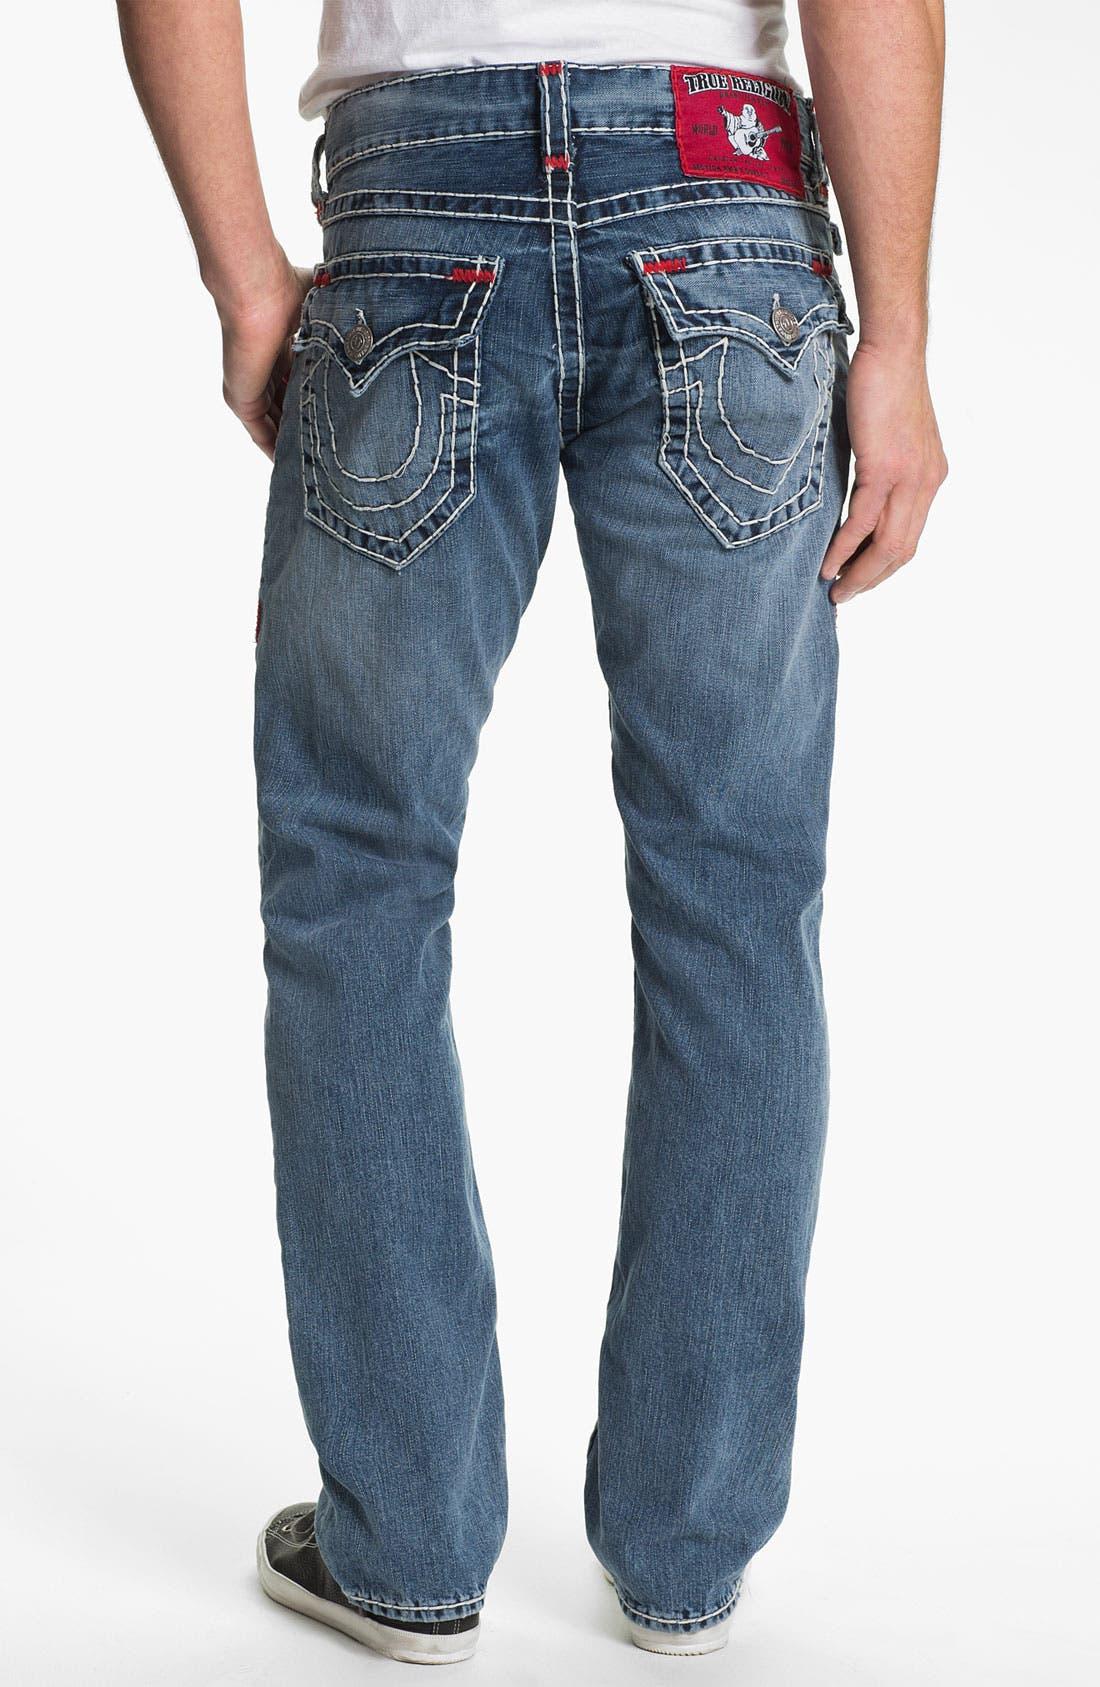 Main Image - True Religion Brand Jeans 'Ricky' Straight Leg Jeans (Shade Horizons)